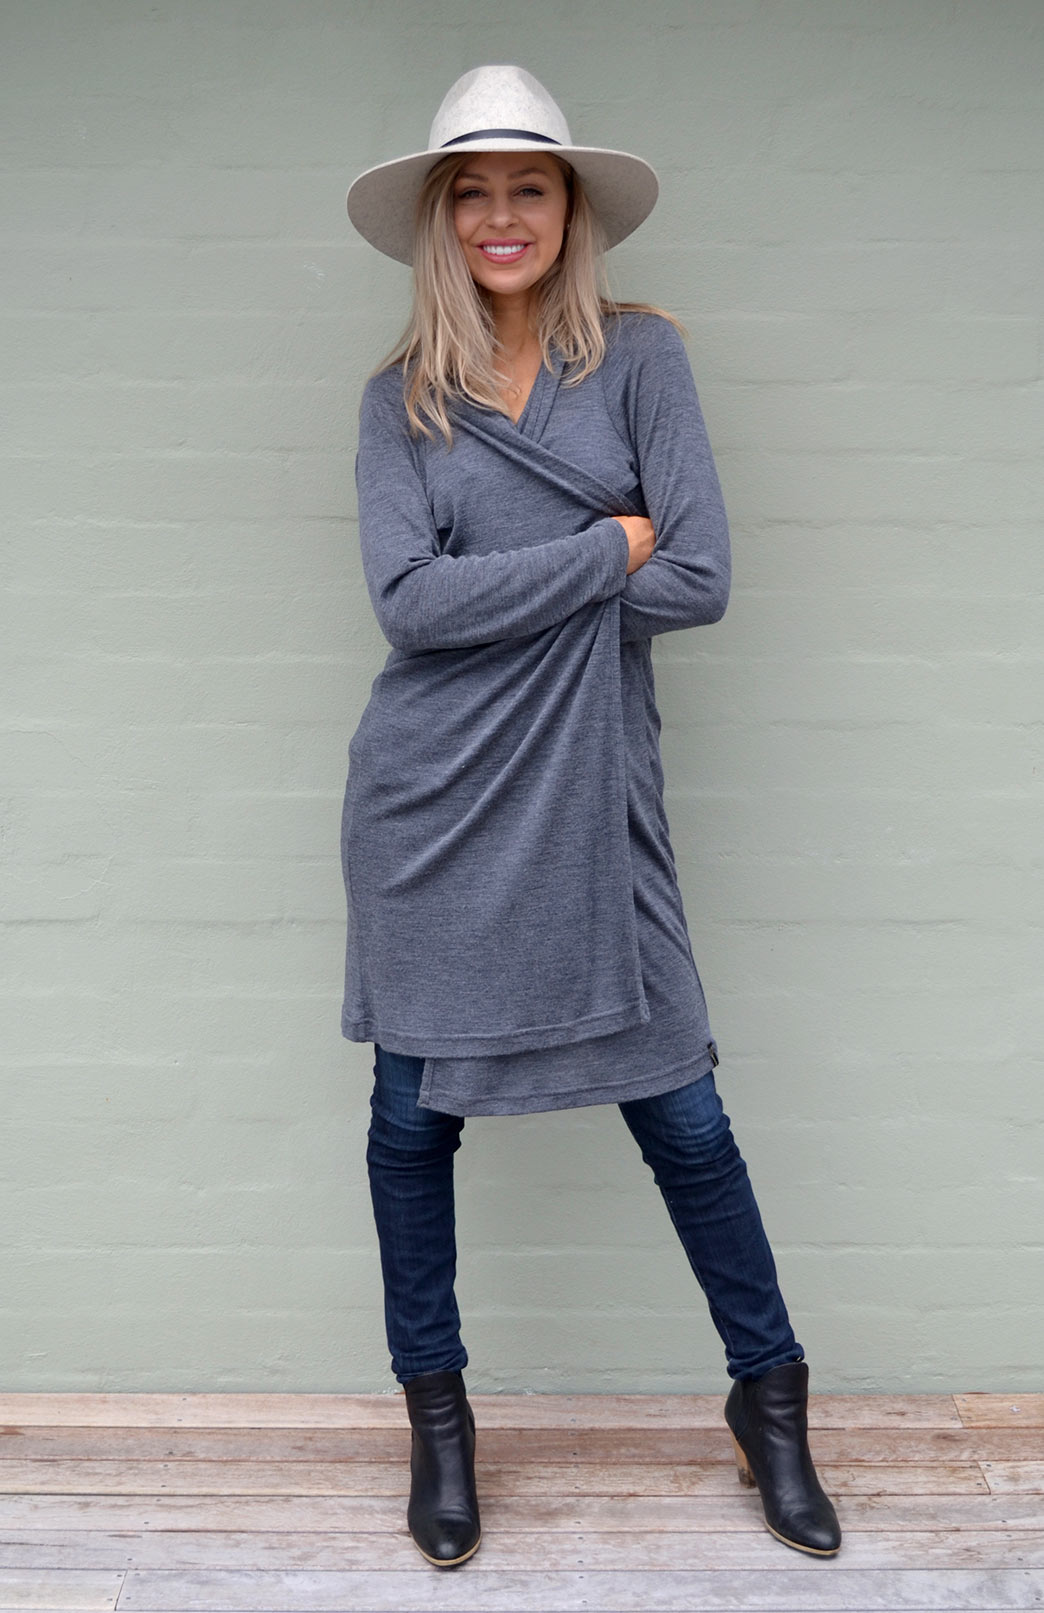 Long Drape Cardigan - Women's Grey Merino Wool Winter Long Drape Cardigan - Smitten Merino Tasmania Australia